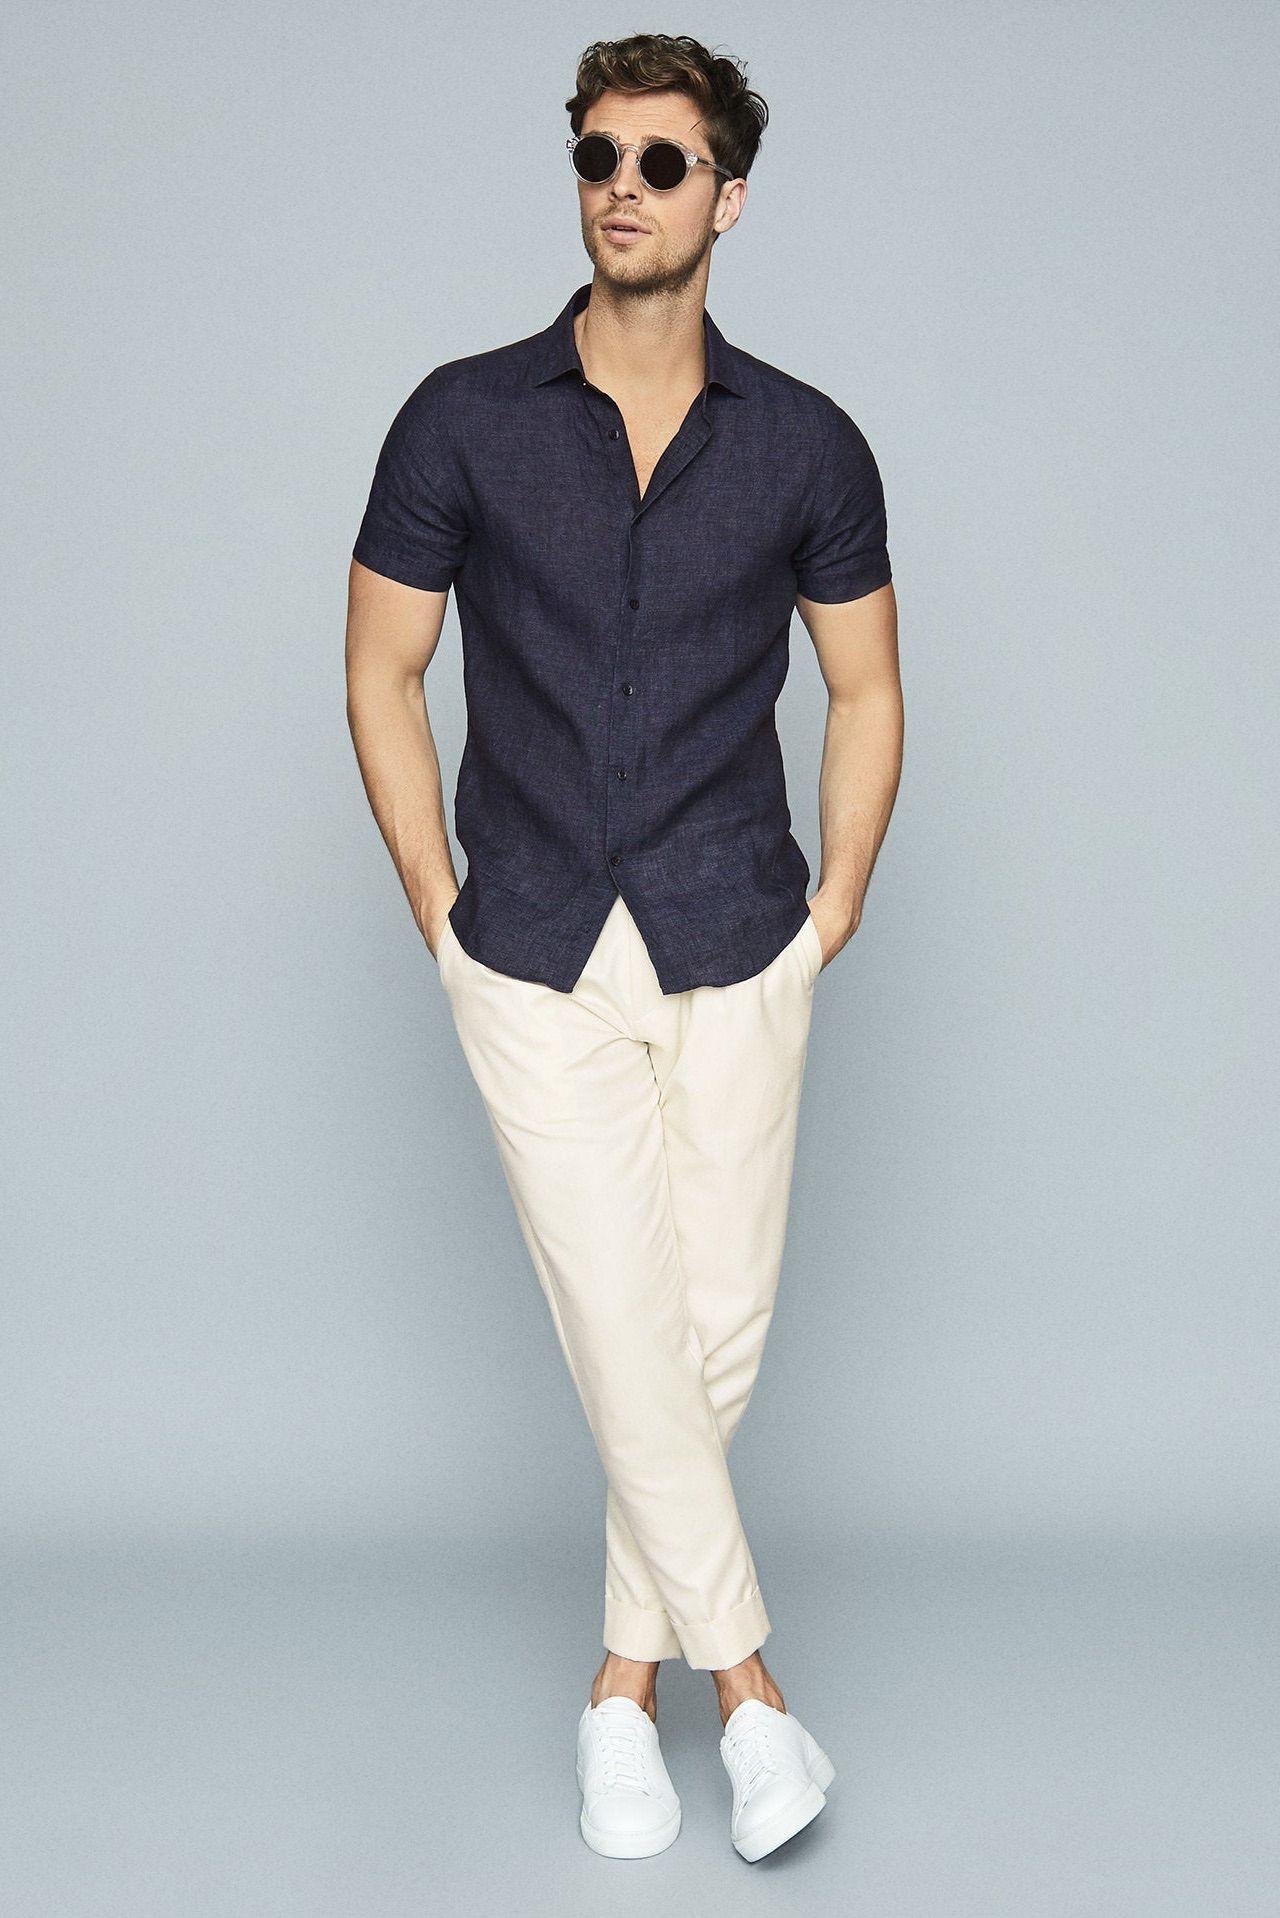 Holiday Linen Shirt -   14 mens holiday Style ideas